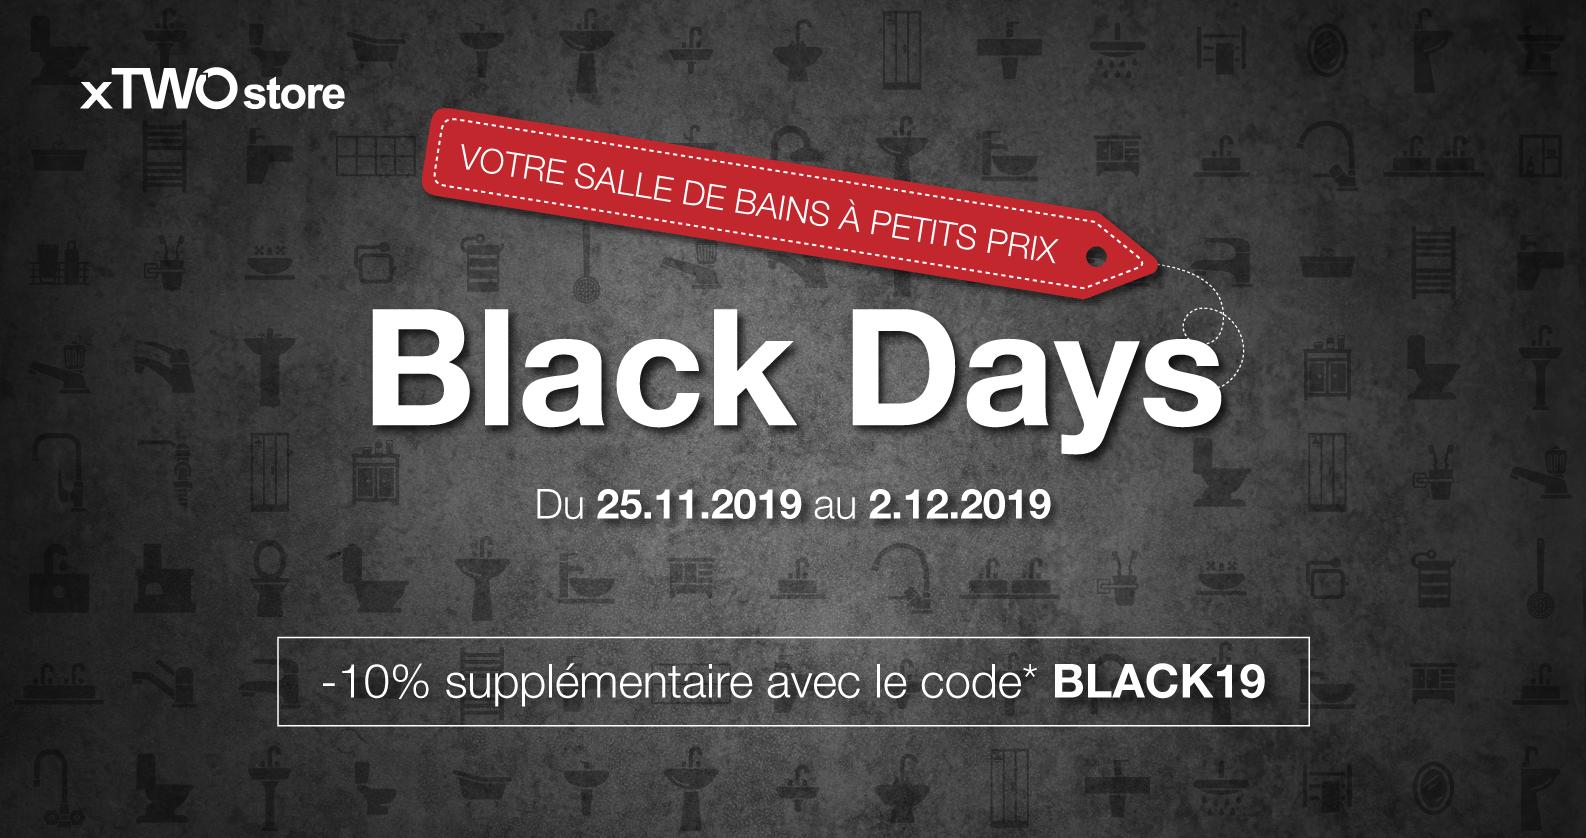 Black Days chez xTWOstore